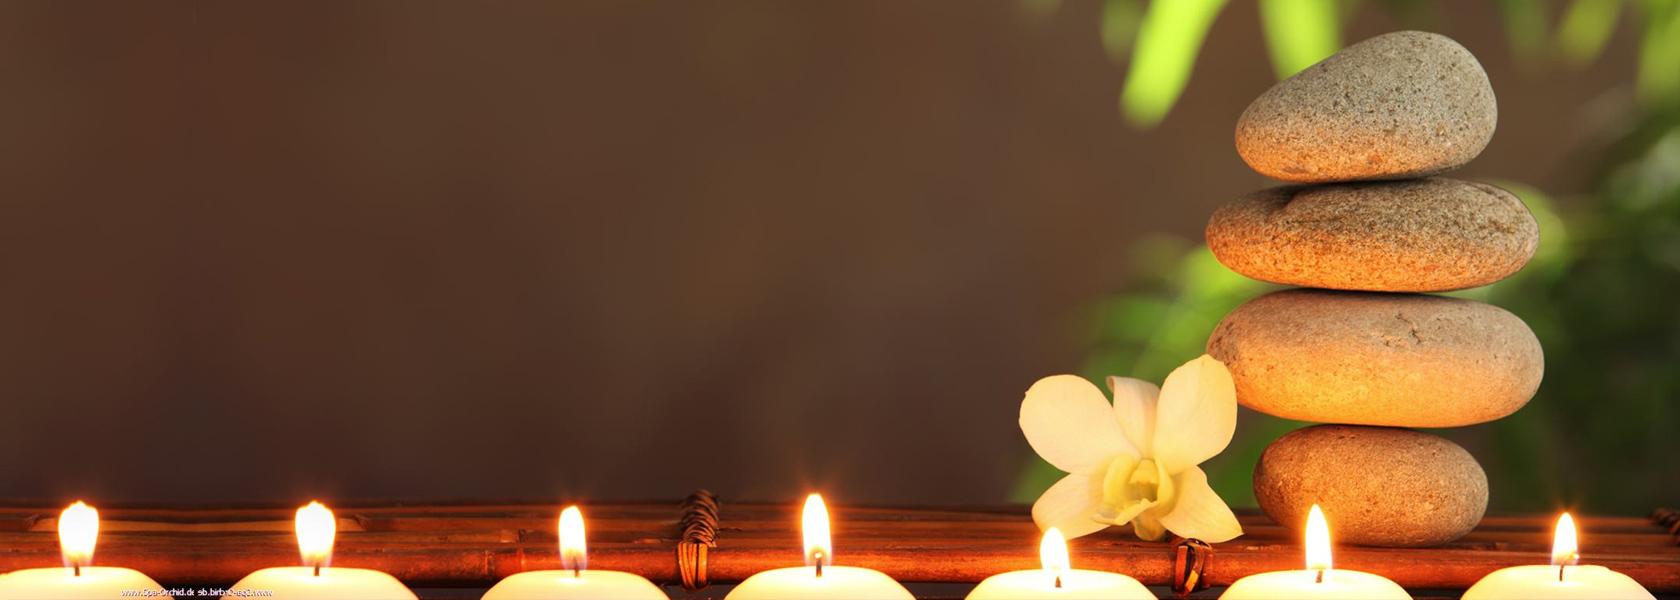 massage hammarby sjöstad thai sundbyberg